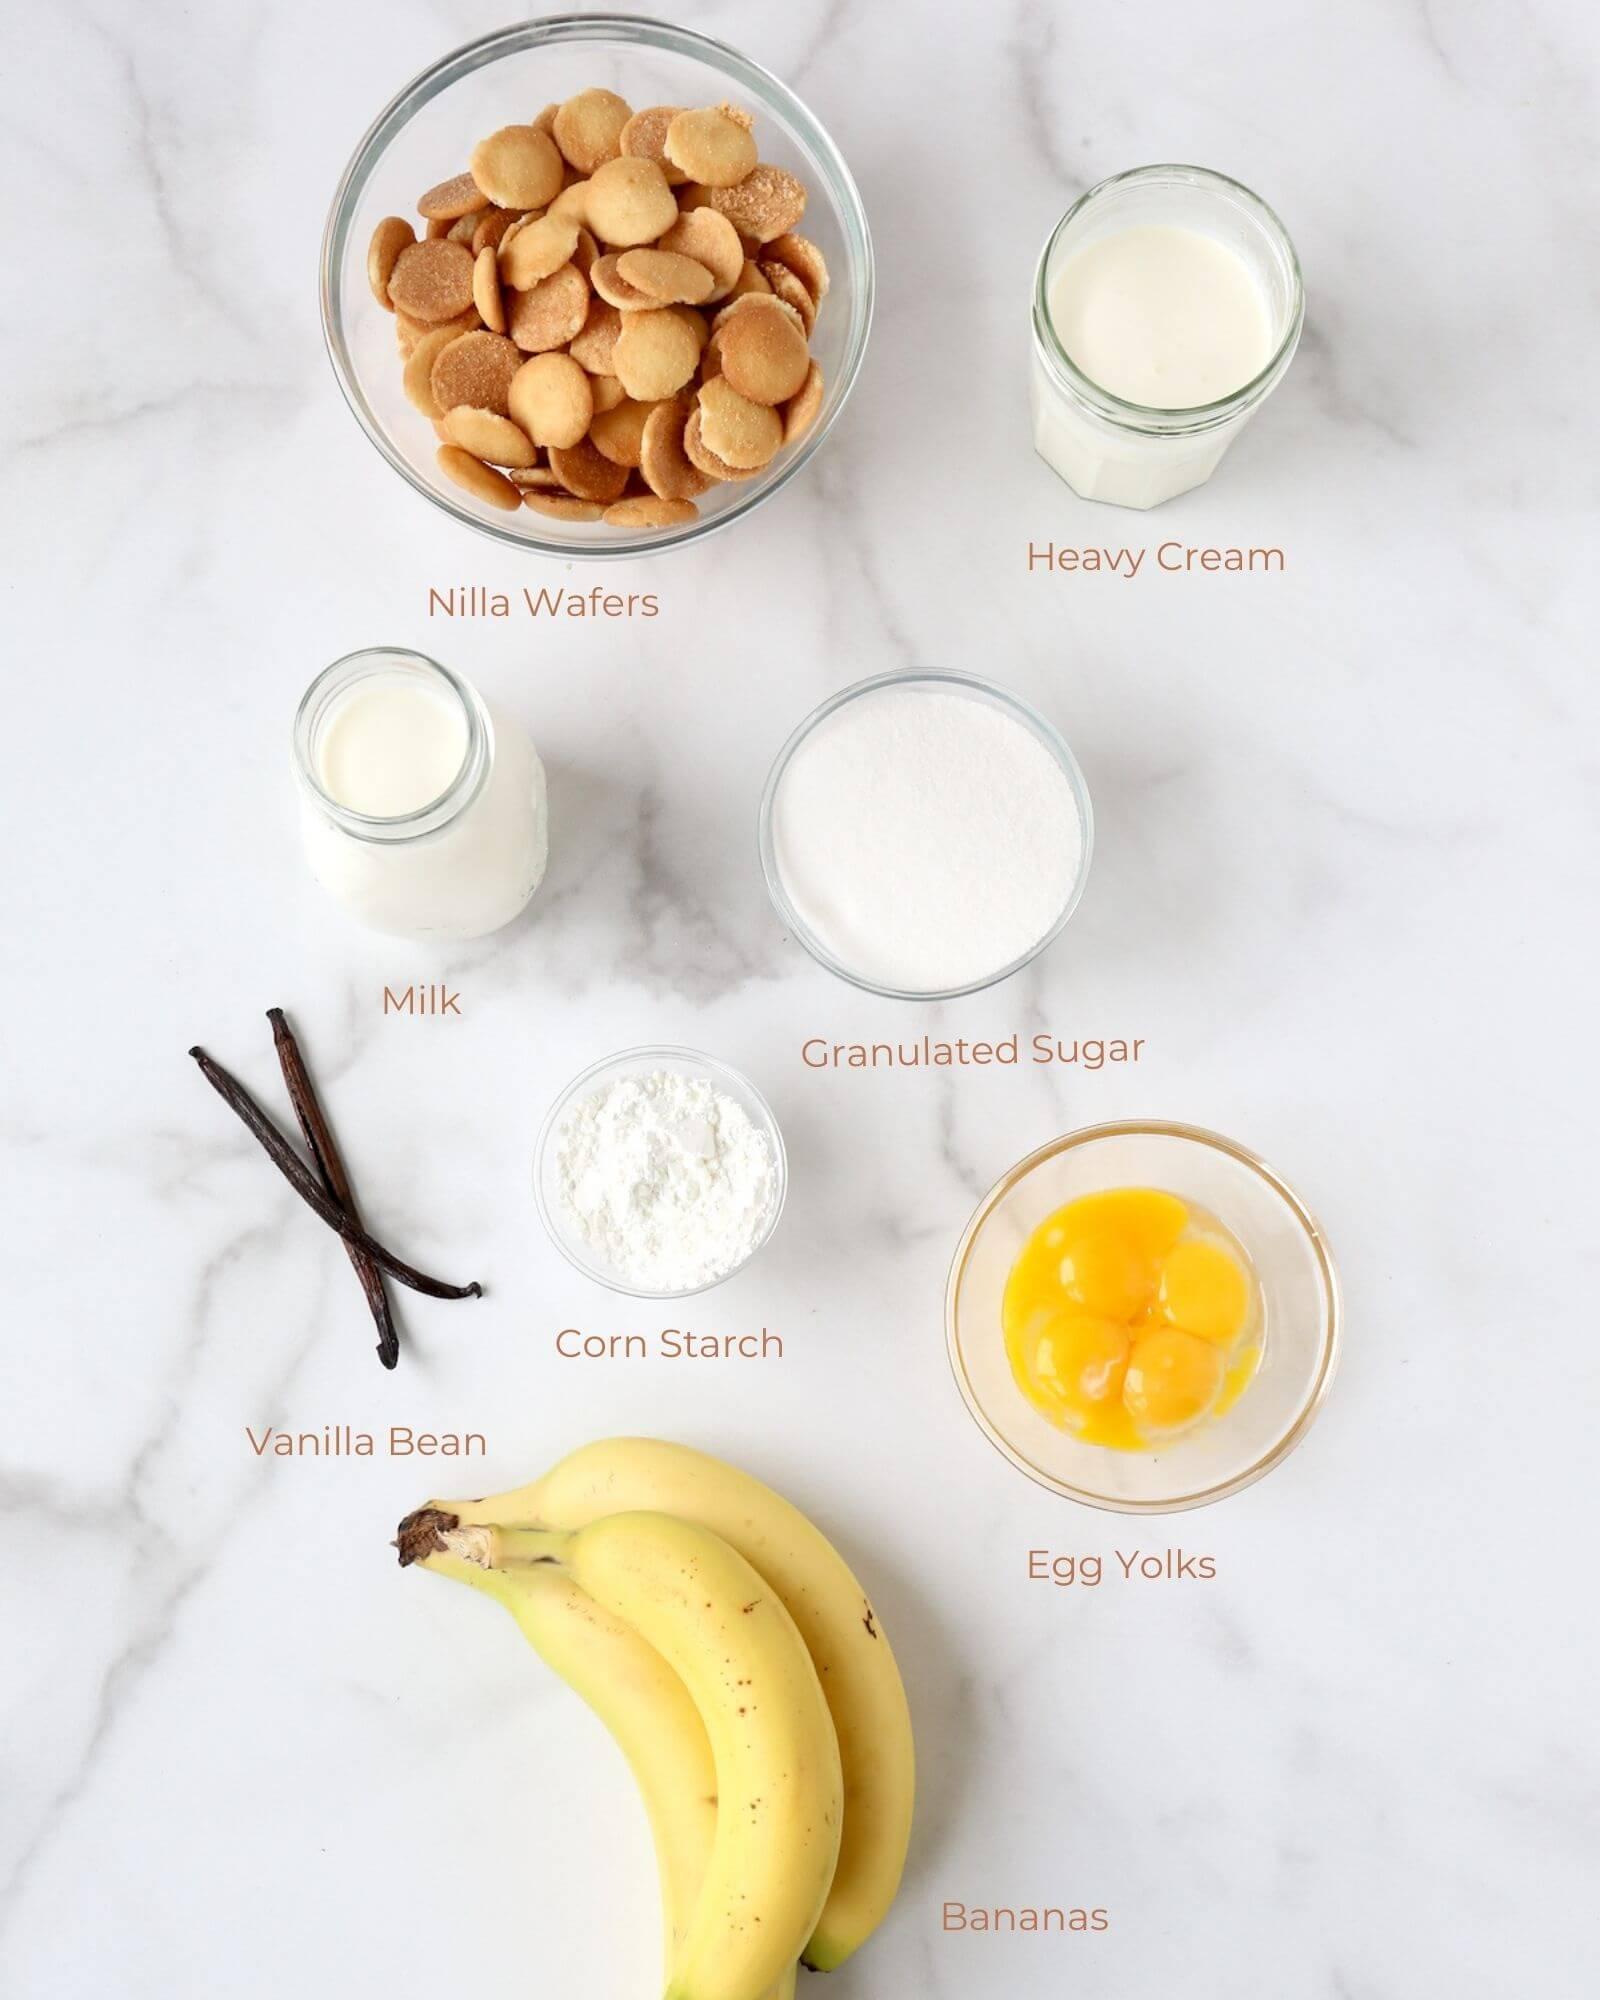 Bowls of wafers, sugar, egg yolks, corn starch, milk, heavy cream, two vanilla beans and bananas.